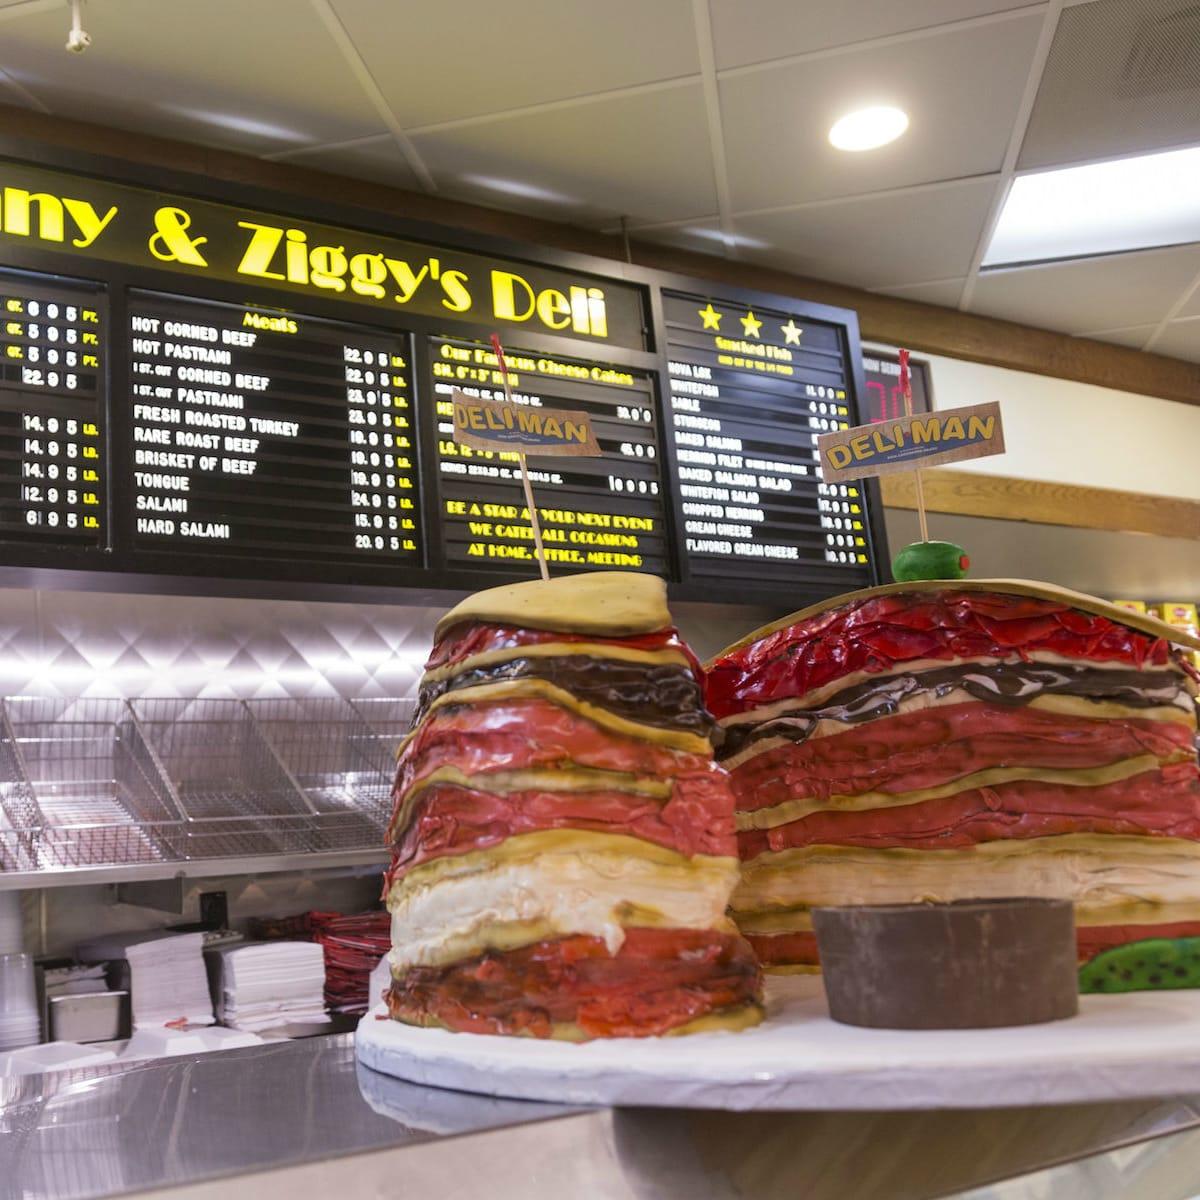 Kenny & Ziggy's Deli Man cake